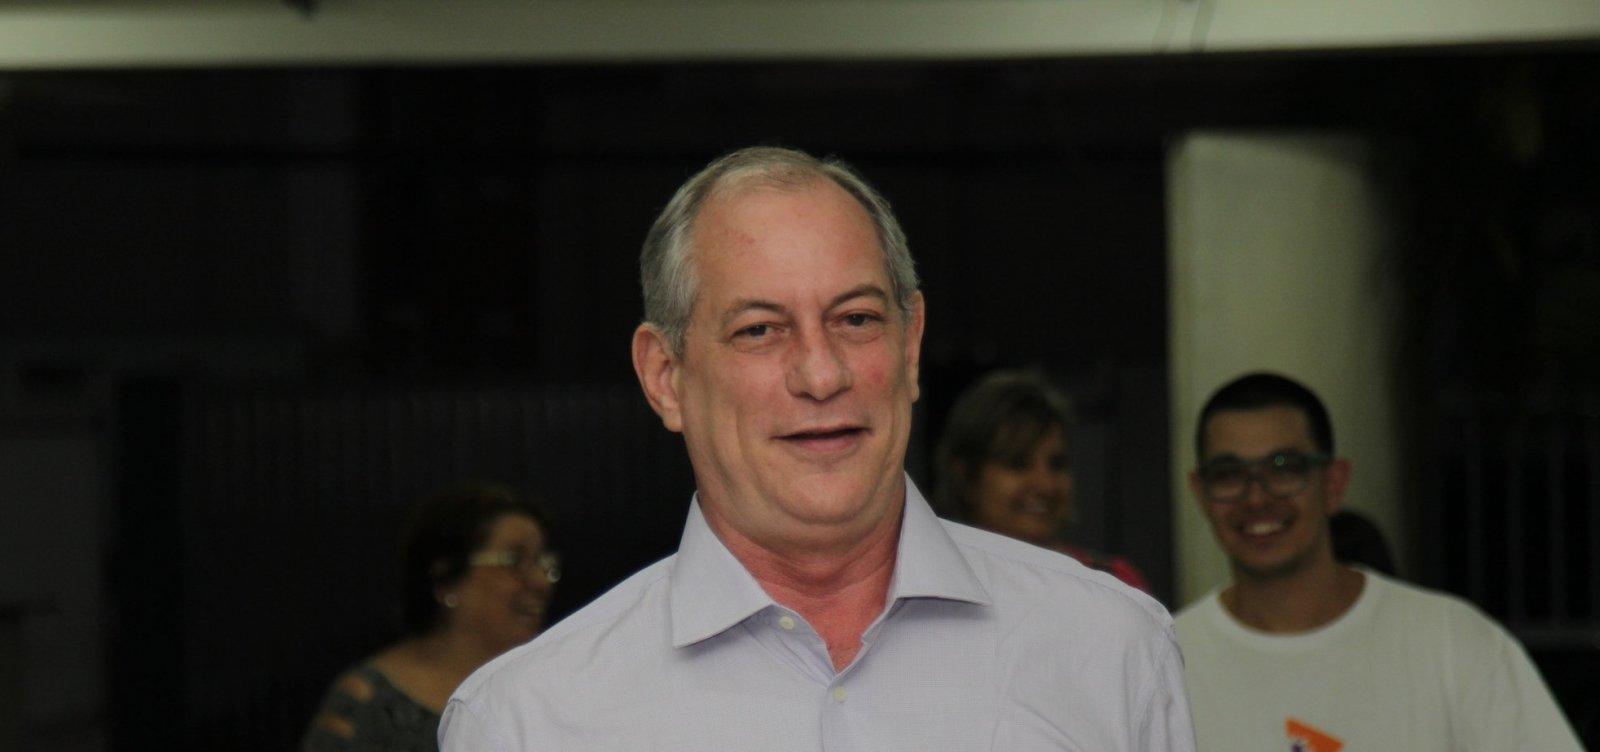 [Ciro desafia Bolsonaro a ir a debate e diz que 'atestado médico falso é crime']